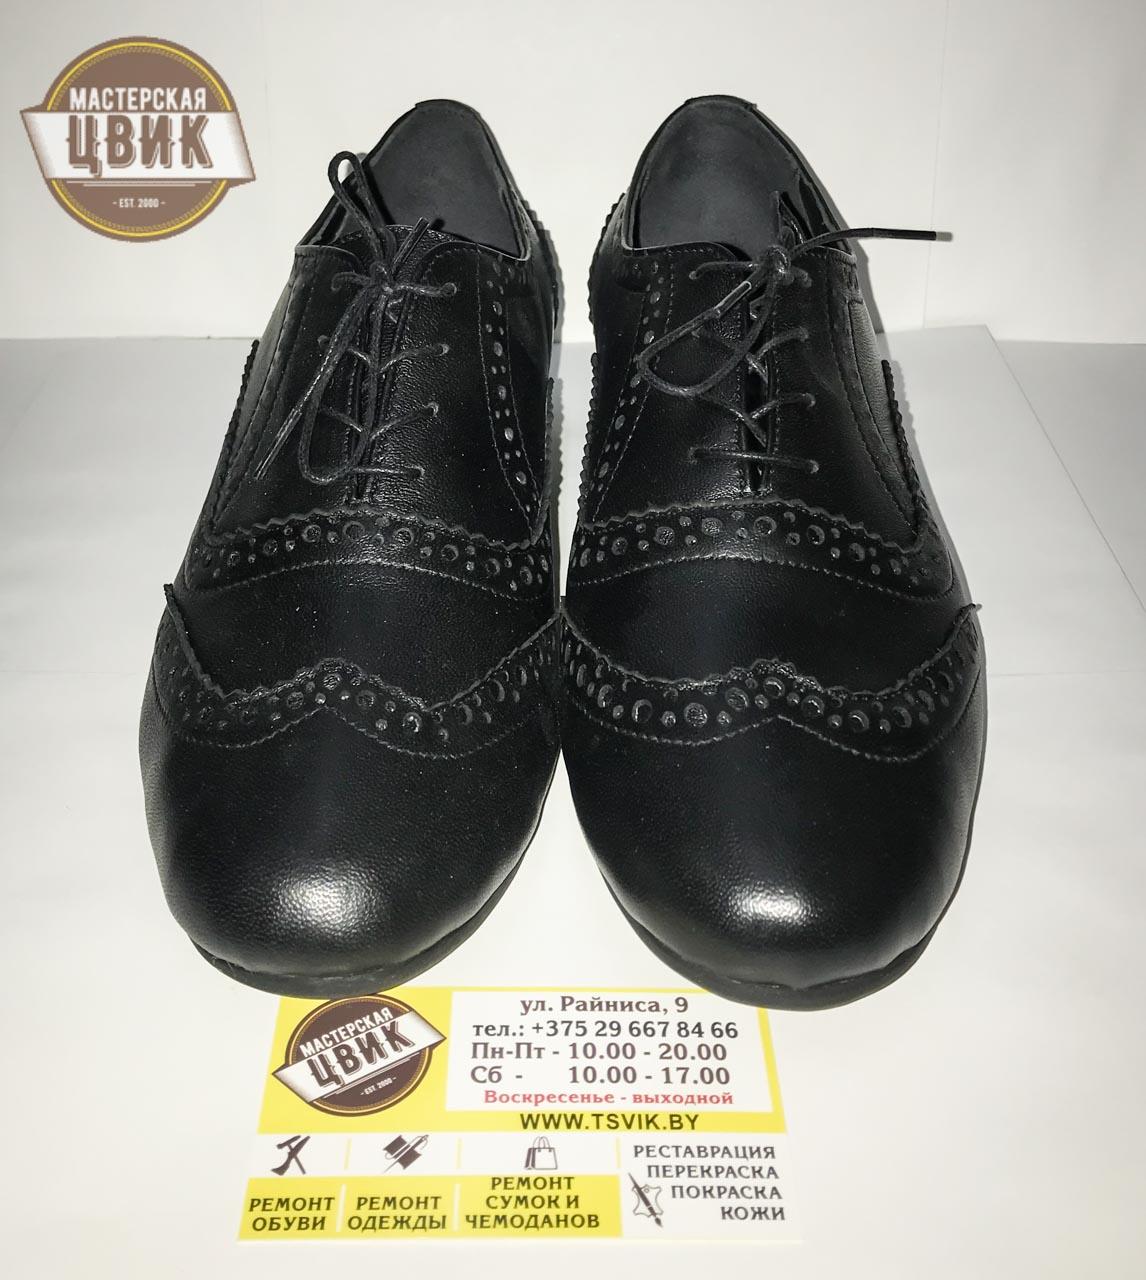 individualnyj-poshiv-obuvi-minsk-8 Индивидуальный пошив обуви